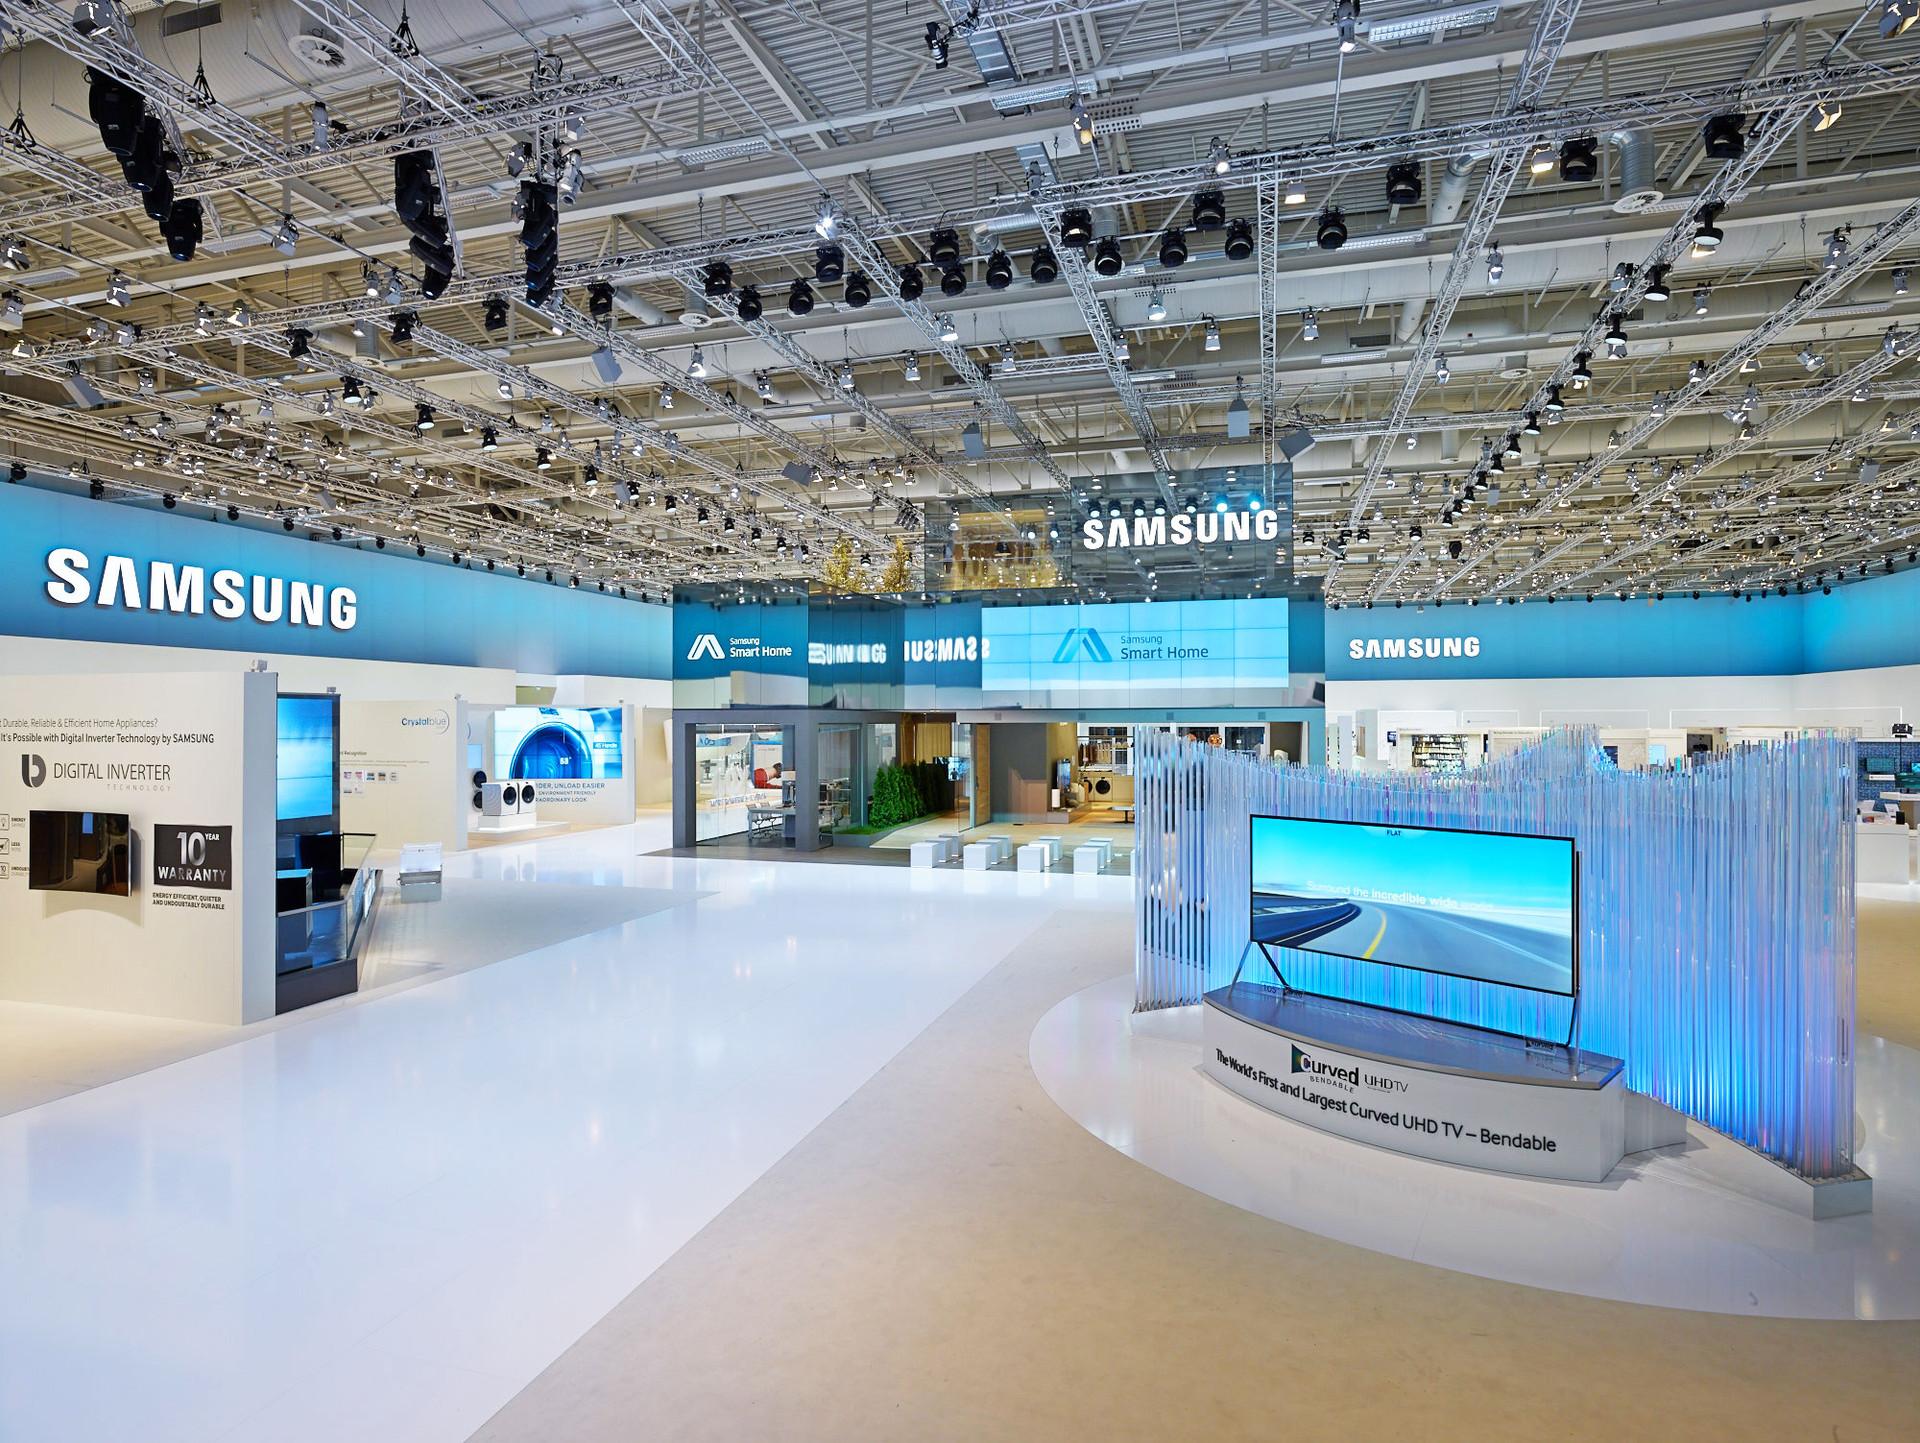 Samsung_IFA_2014_03.jpg